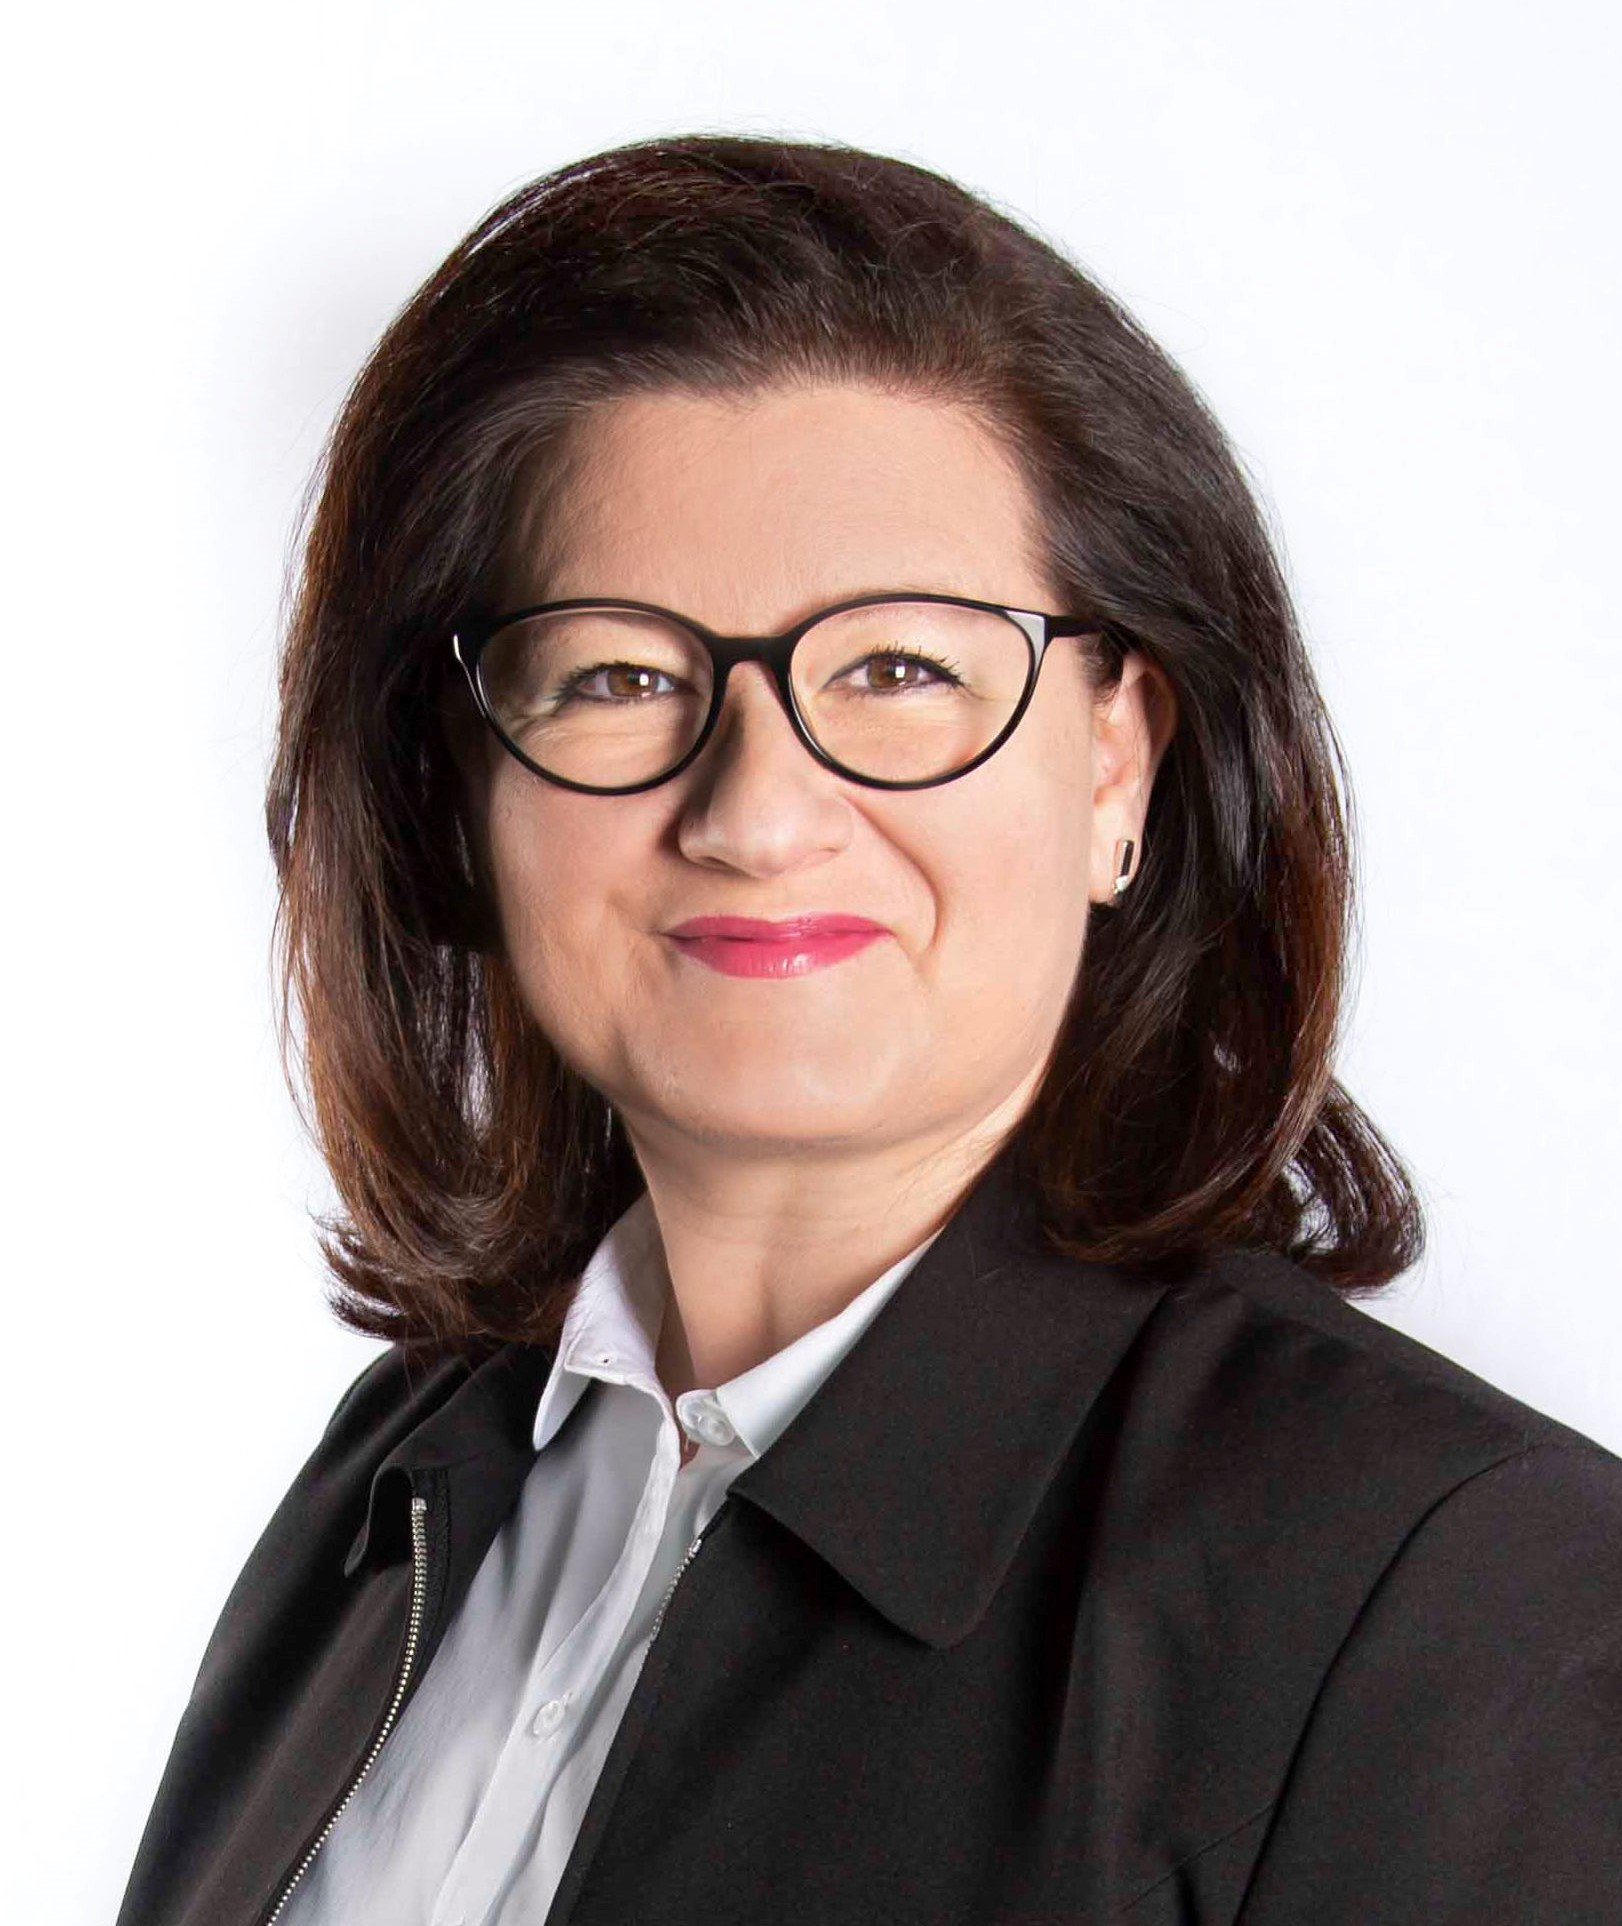 Andrea Sihn-Weber